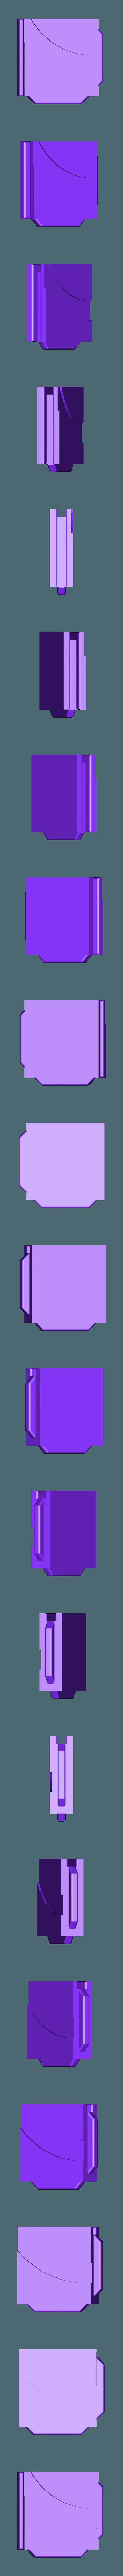 Piece - Part 11.stl Download free STL file Taquin CULTS / Sliding Puzzle • 3D print model, Valelab3D